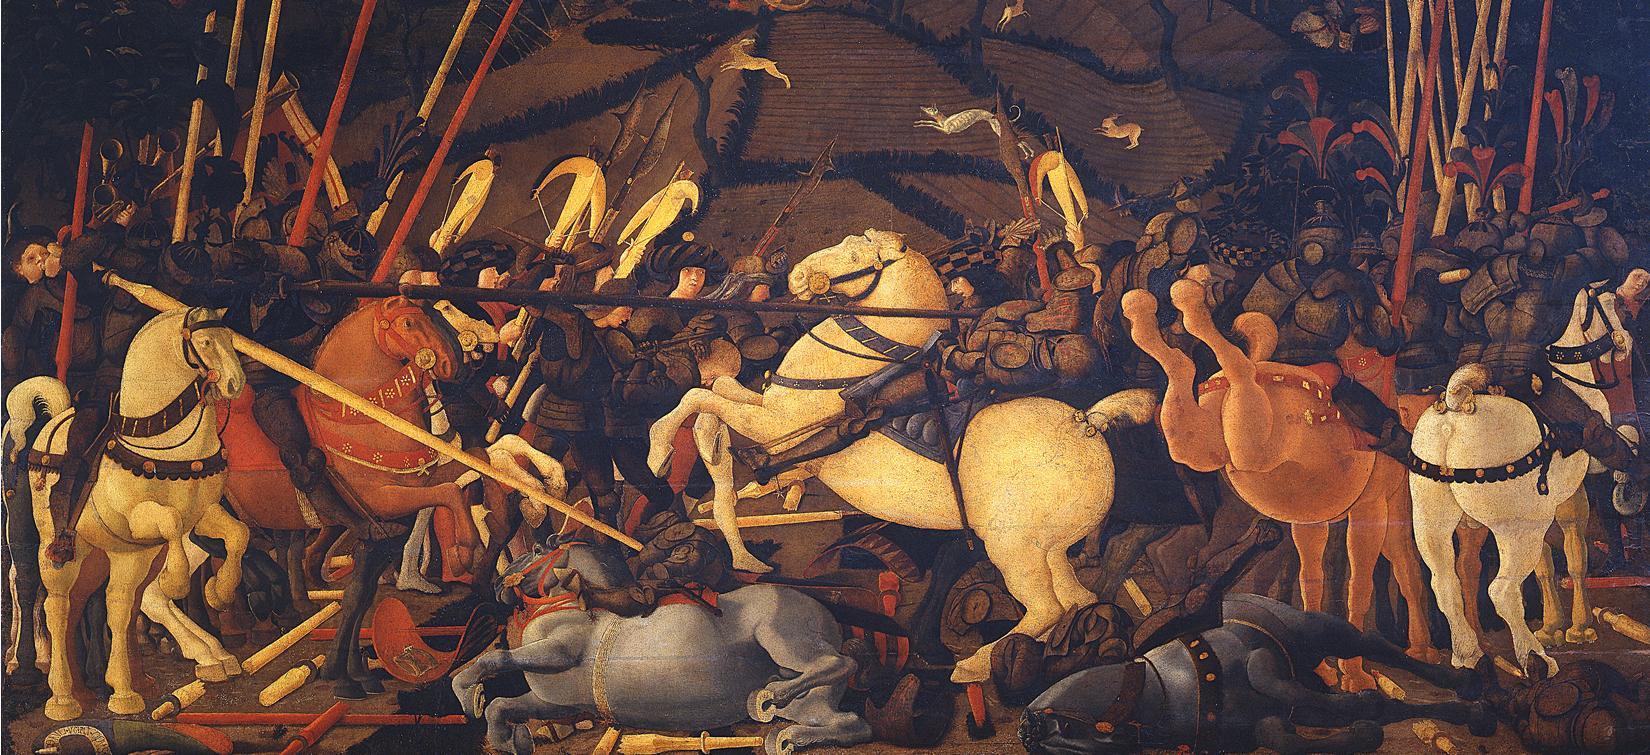 картина Бернардино Делла Сиарда падает с  лошади, Учелло - Учелло Паоло (Paolo Uccello) фото